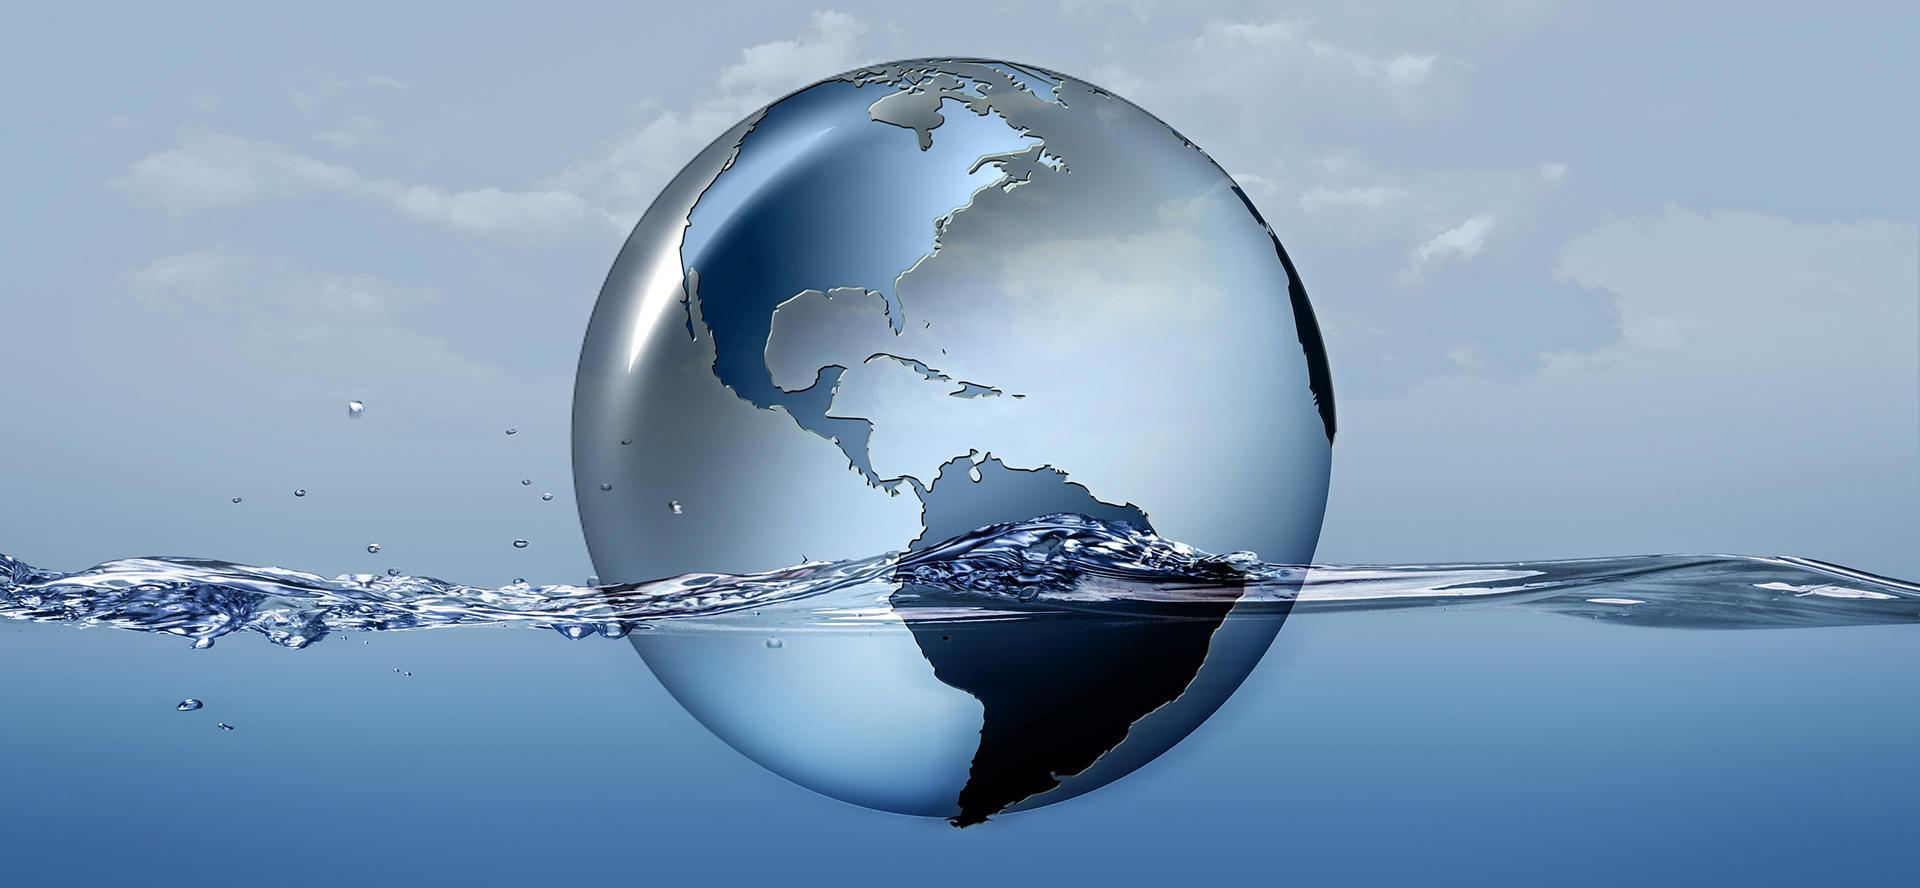 Insula Danmark bæredygtighed